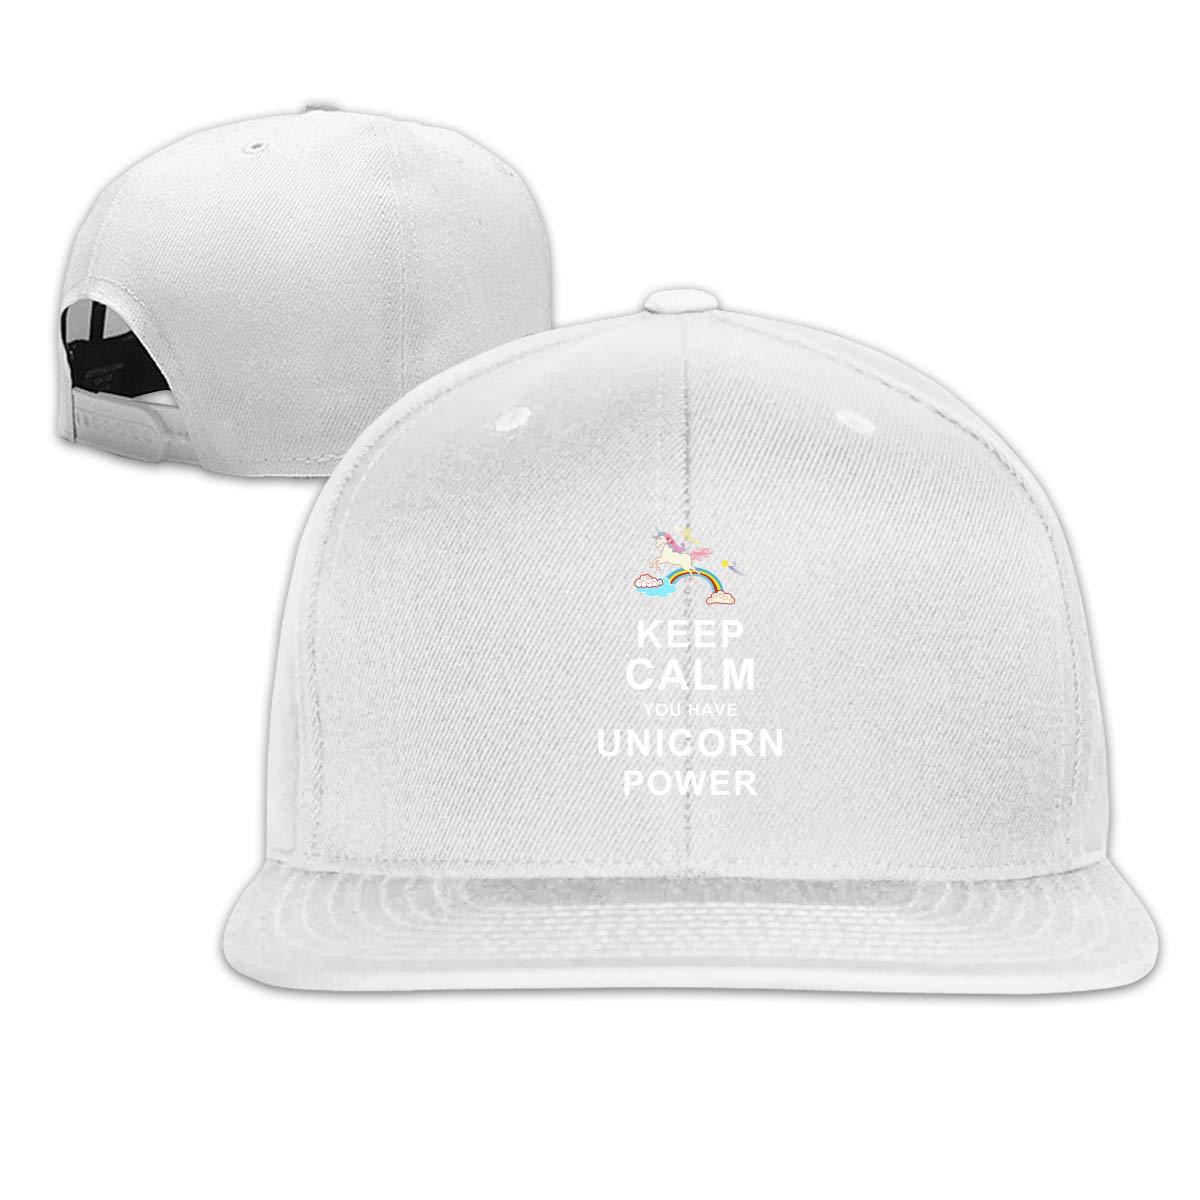 MOCSTONE Unisex Snapback Hat Keep Calm You Have Unicorn Power Adjustable Baseball Cap